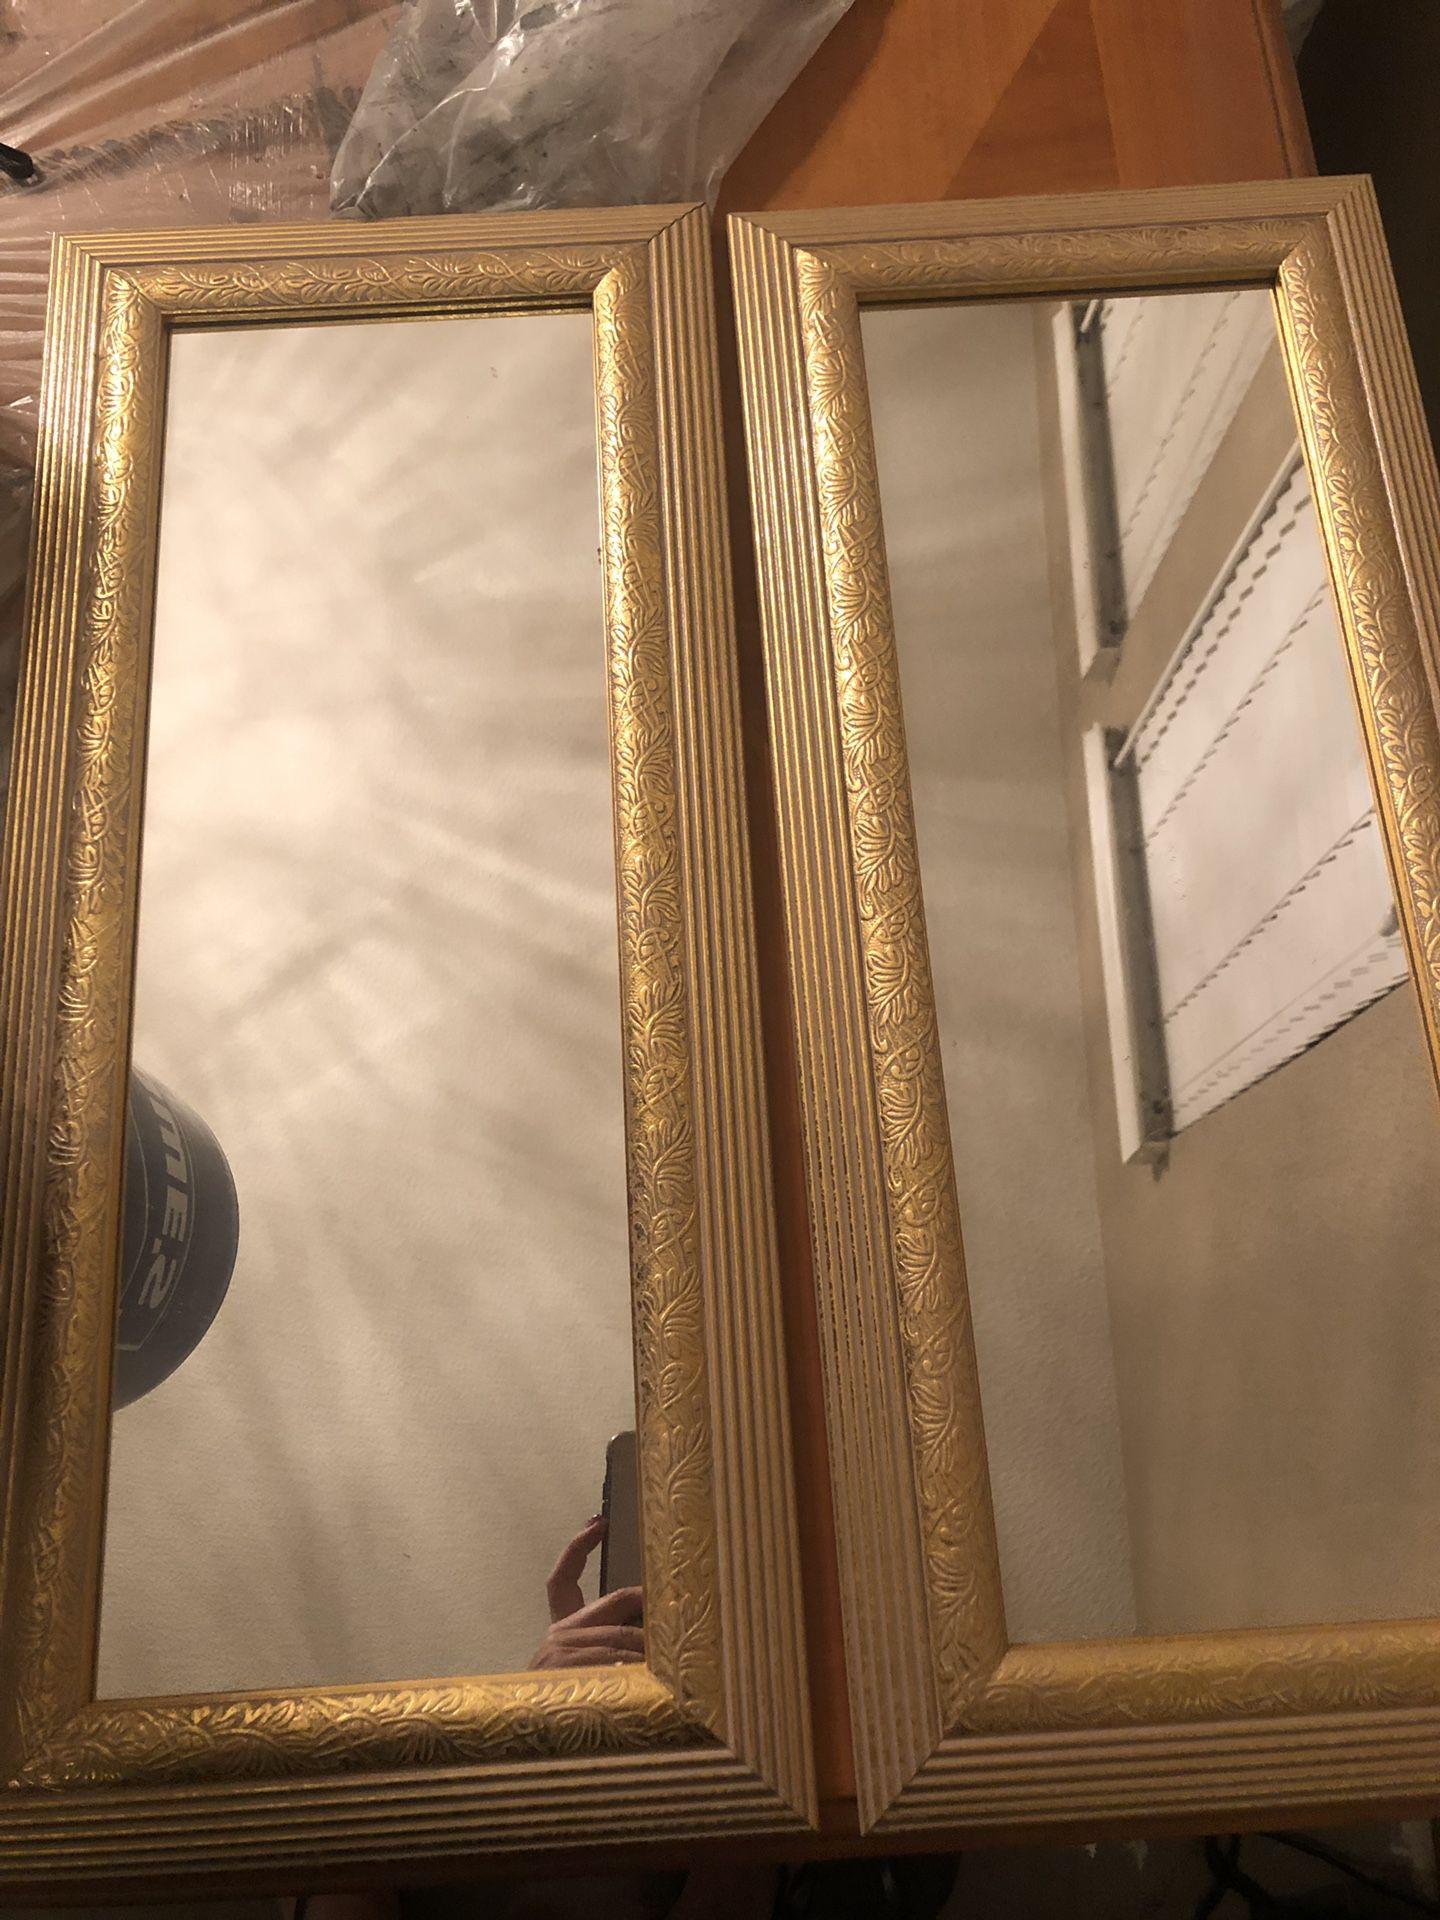 2 gold mirrors